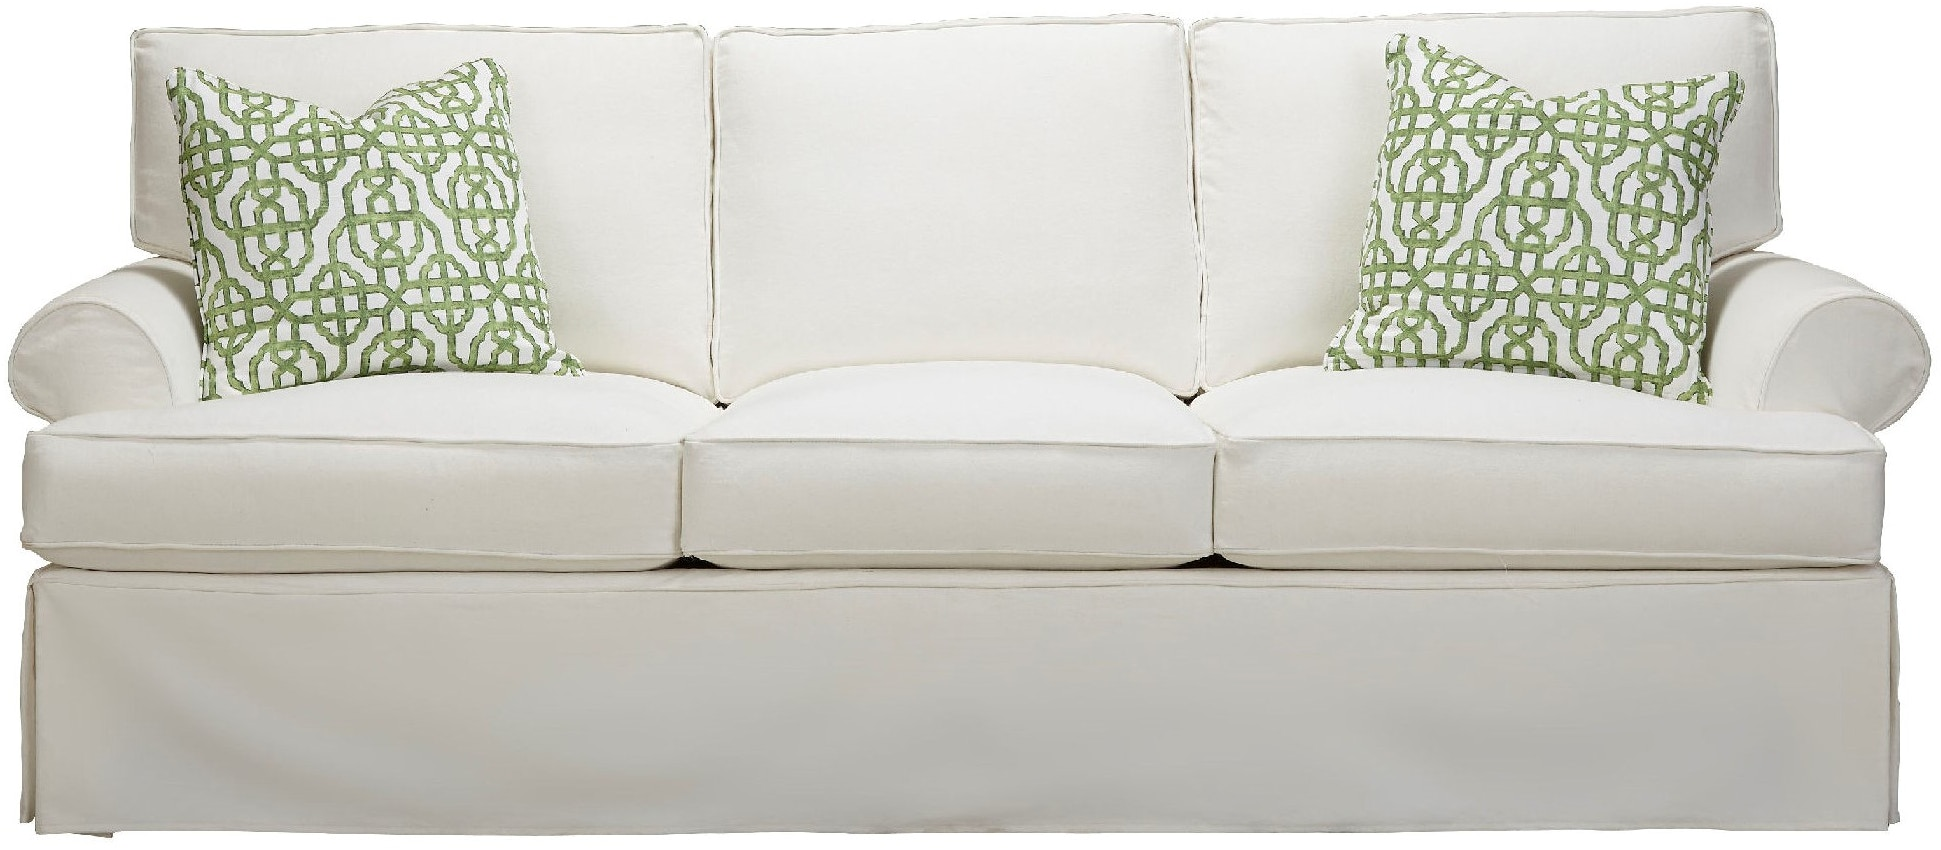 Southern Furniture Living Room Sarah Slipcover Sofa 58371 Whitley